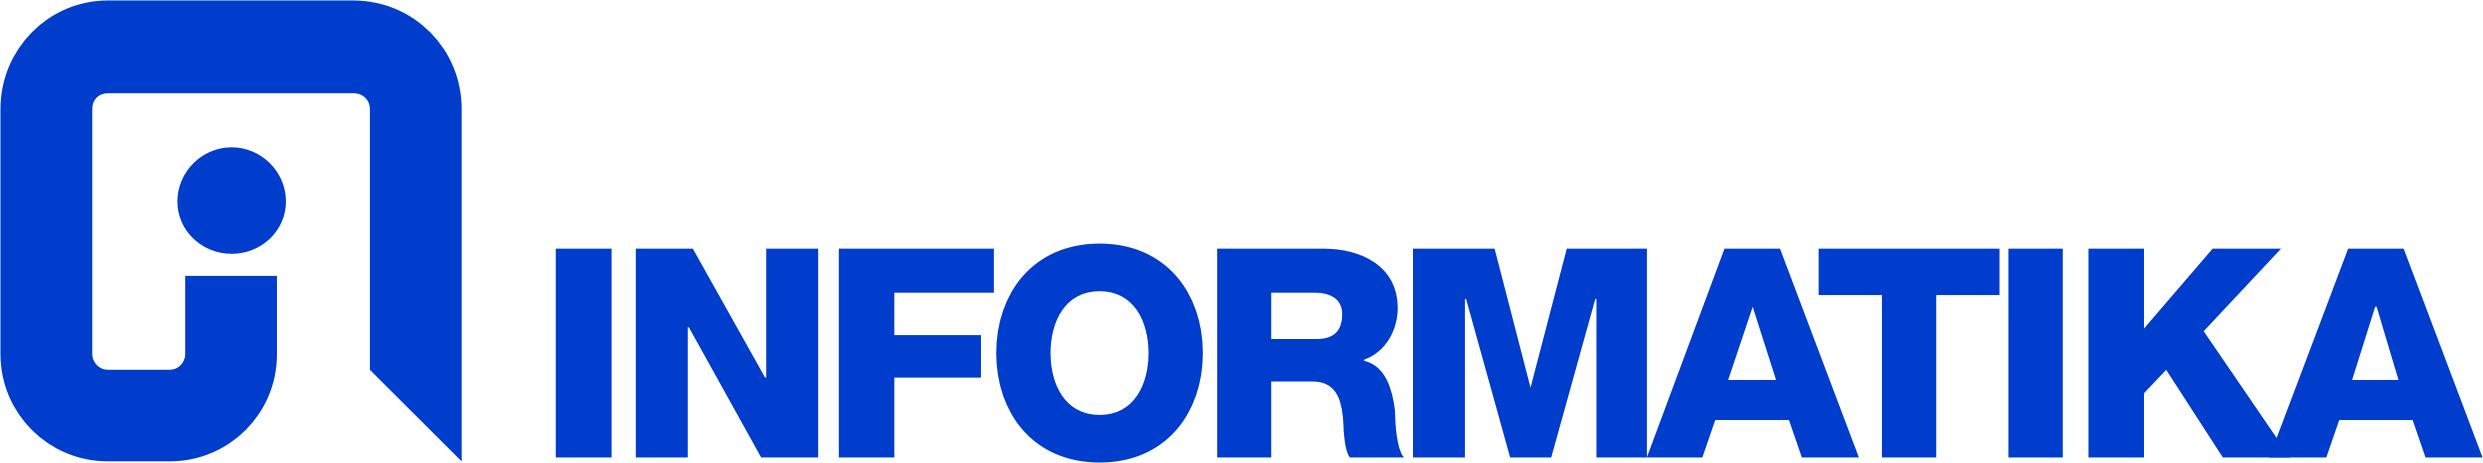 informatika_logo-10070020-1